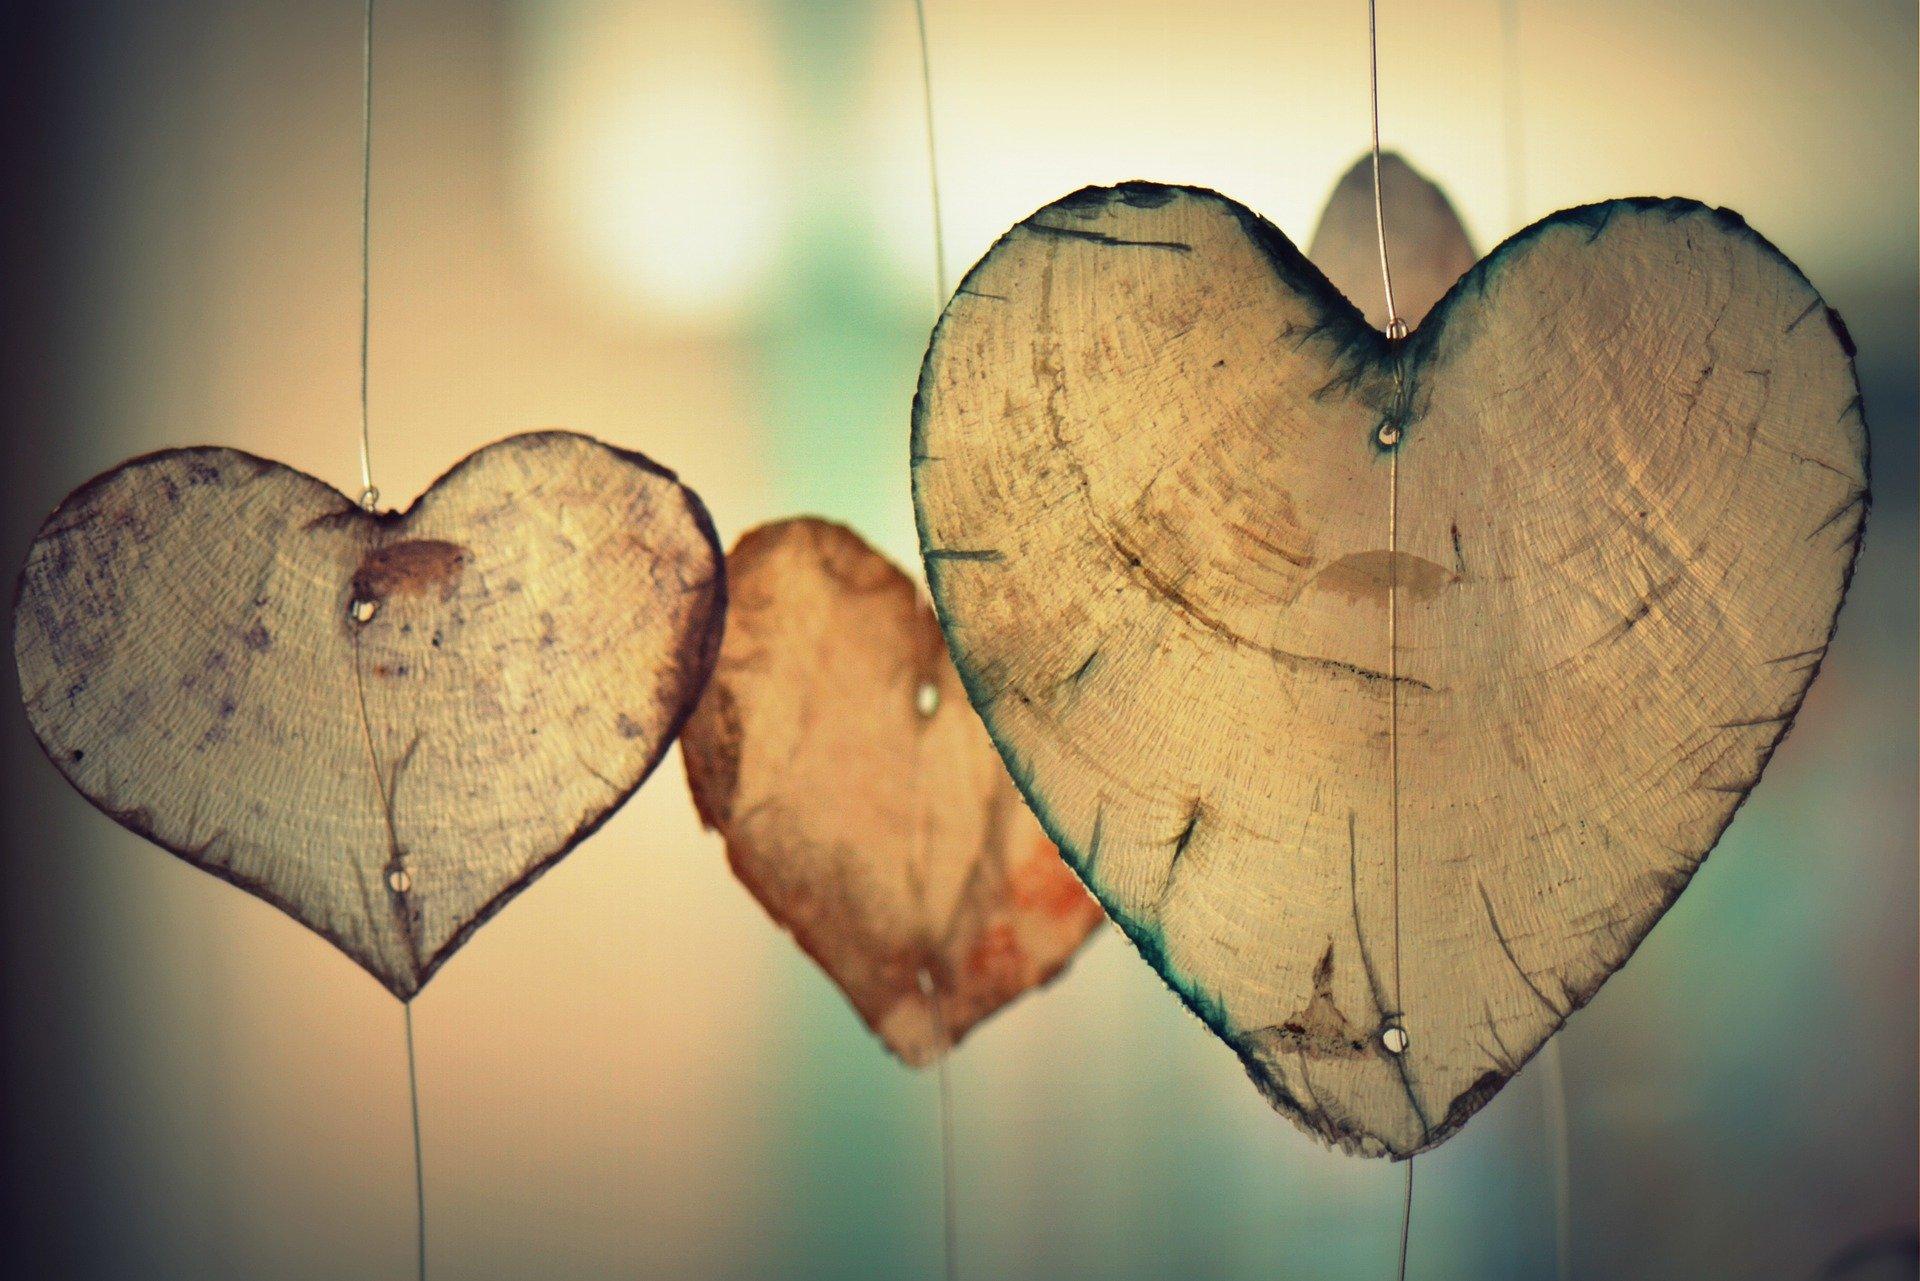 Me han diagnosticado insuficiencia cardiaca, ¿qué significa?. Vivir con insuficiencia cardiaca